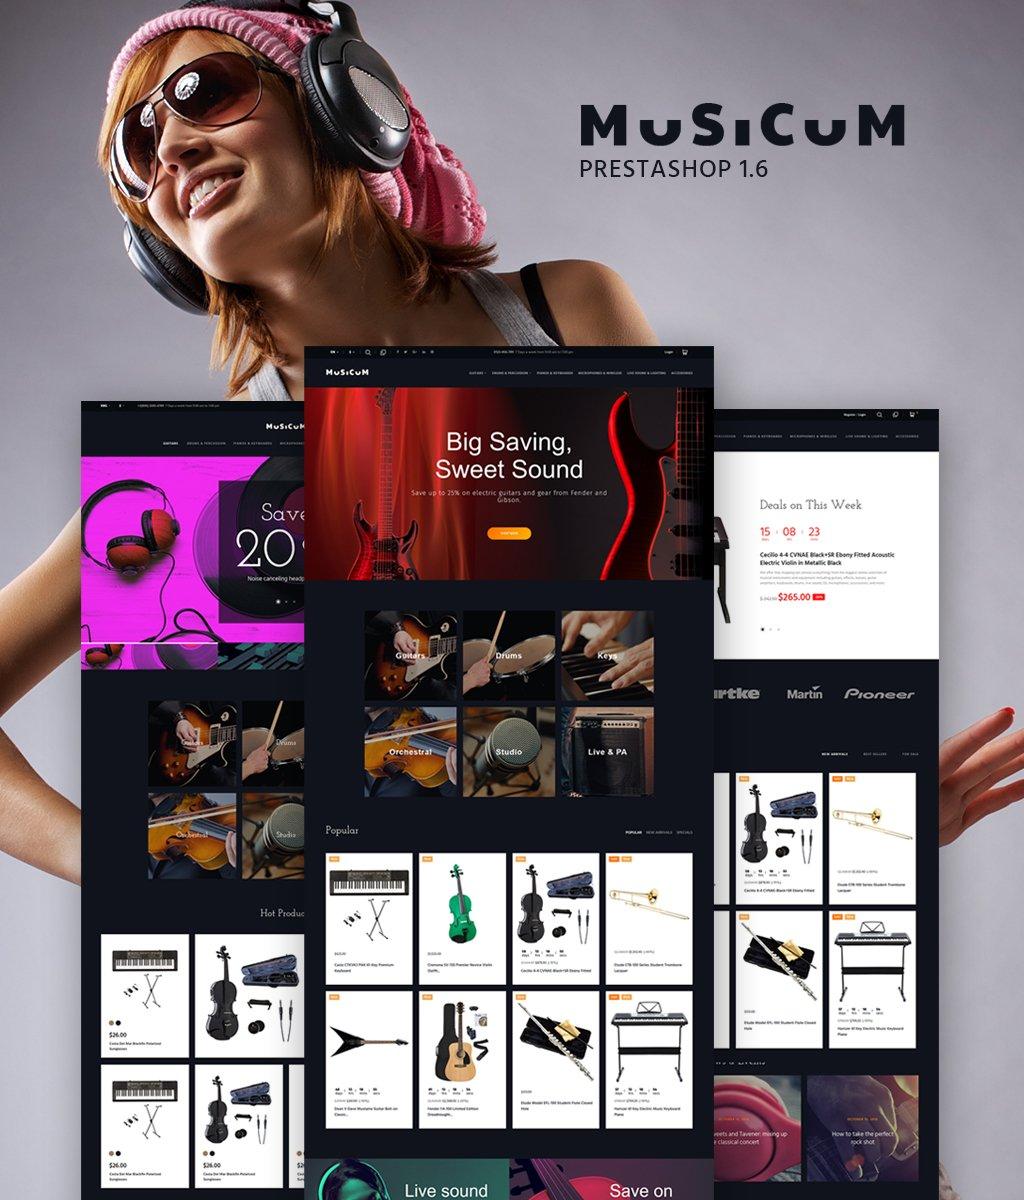 Musicum PrestaShop Theme - screenshot